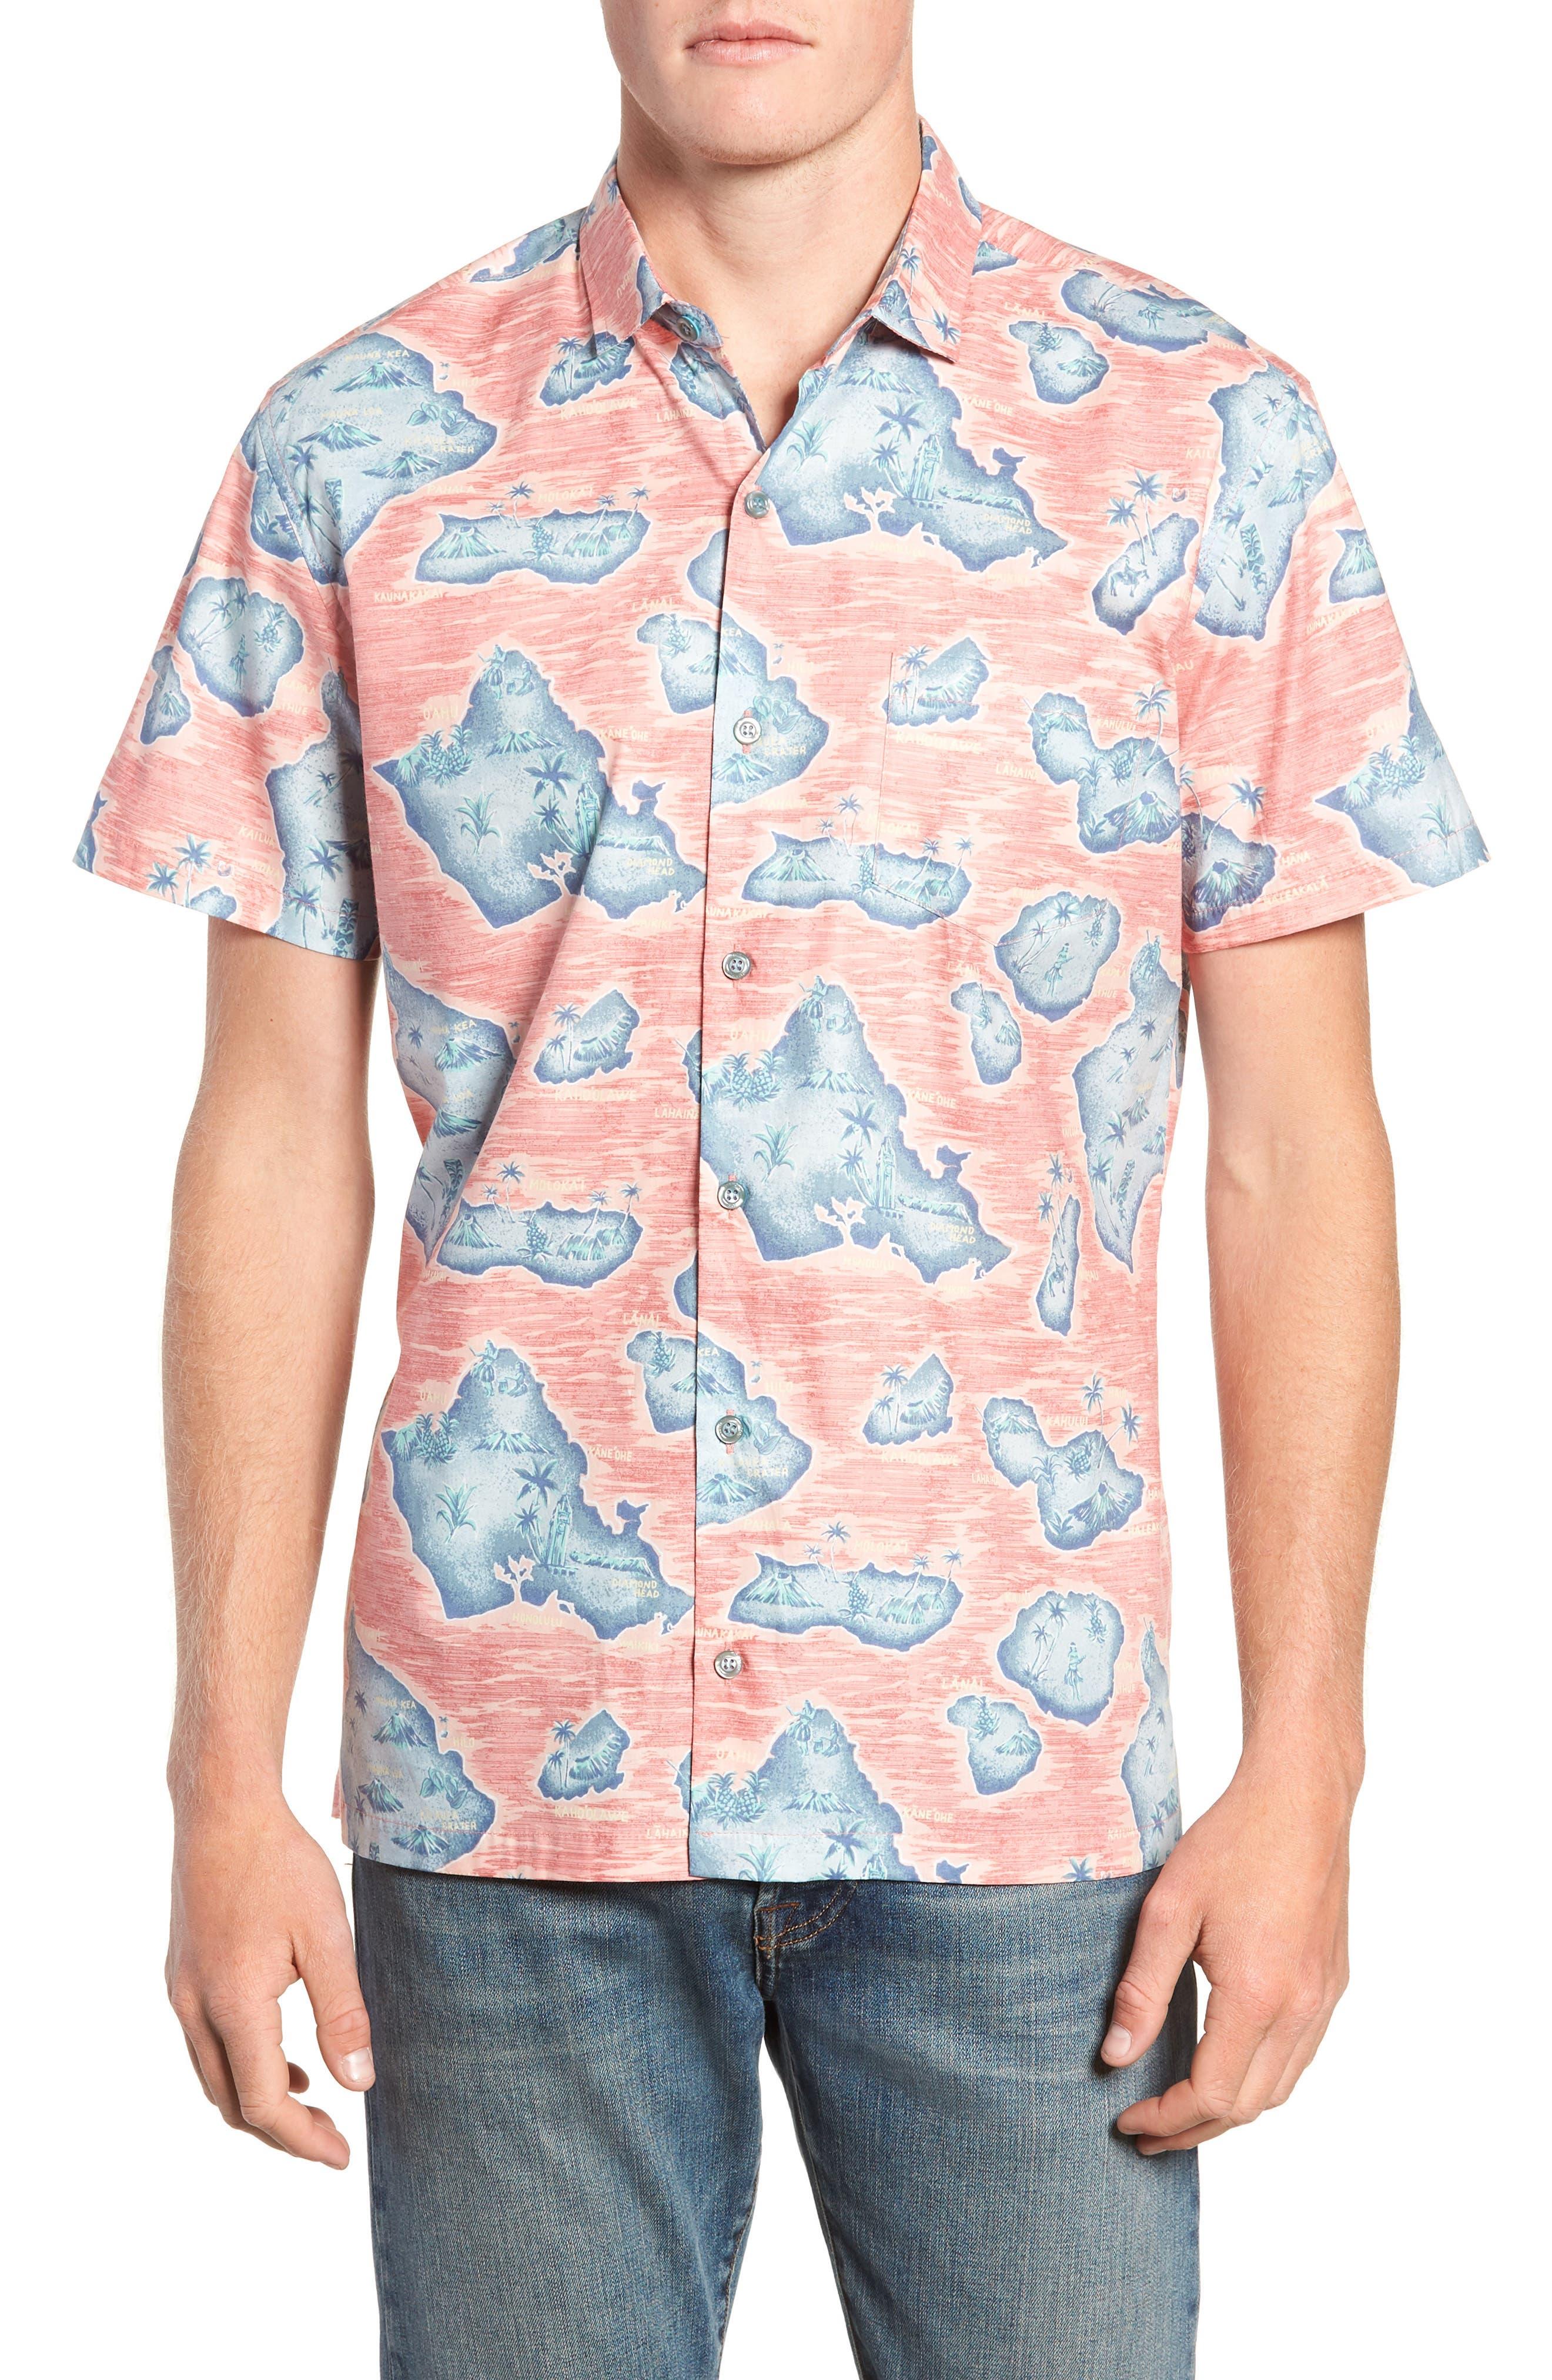 Sandwich Isle Regular Fit Sport Shirt,                             Main thumbnail 1, color,                             HAWAIIAN SALT